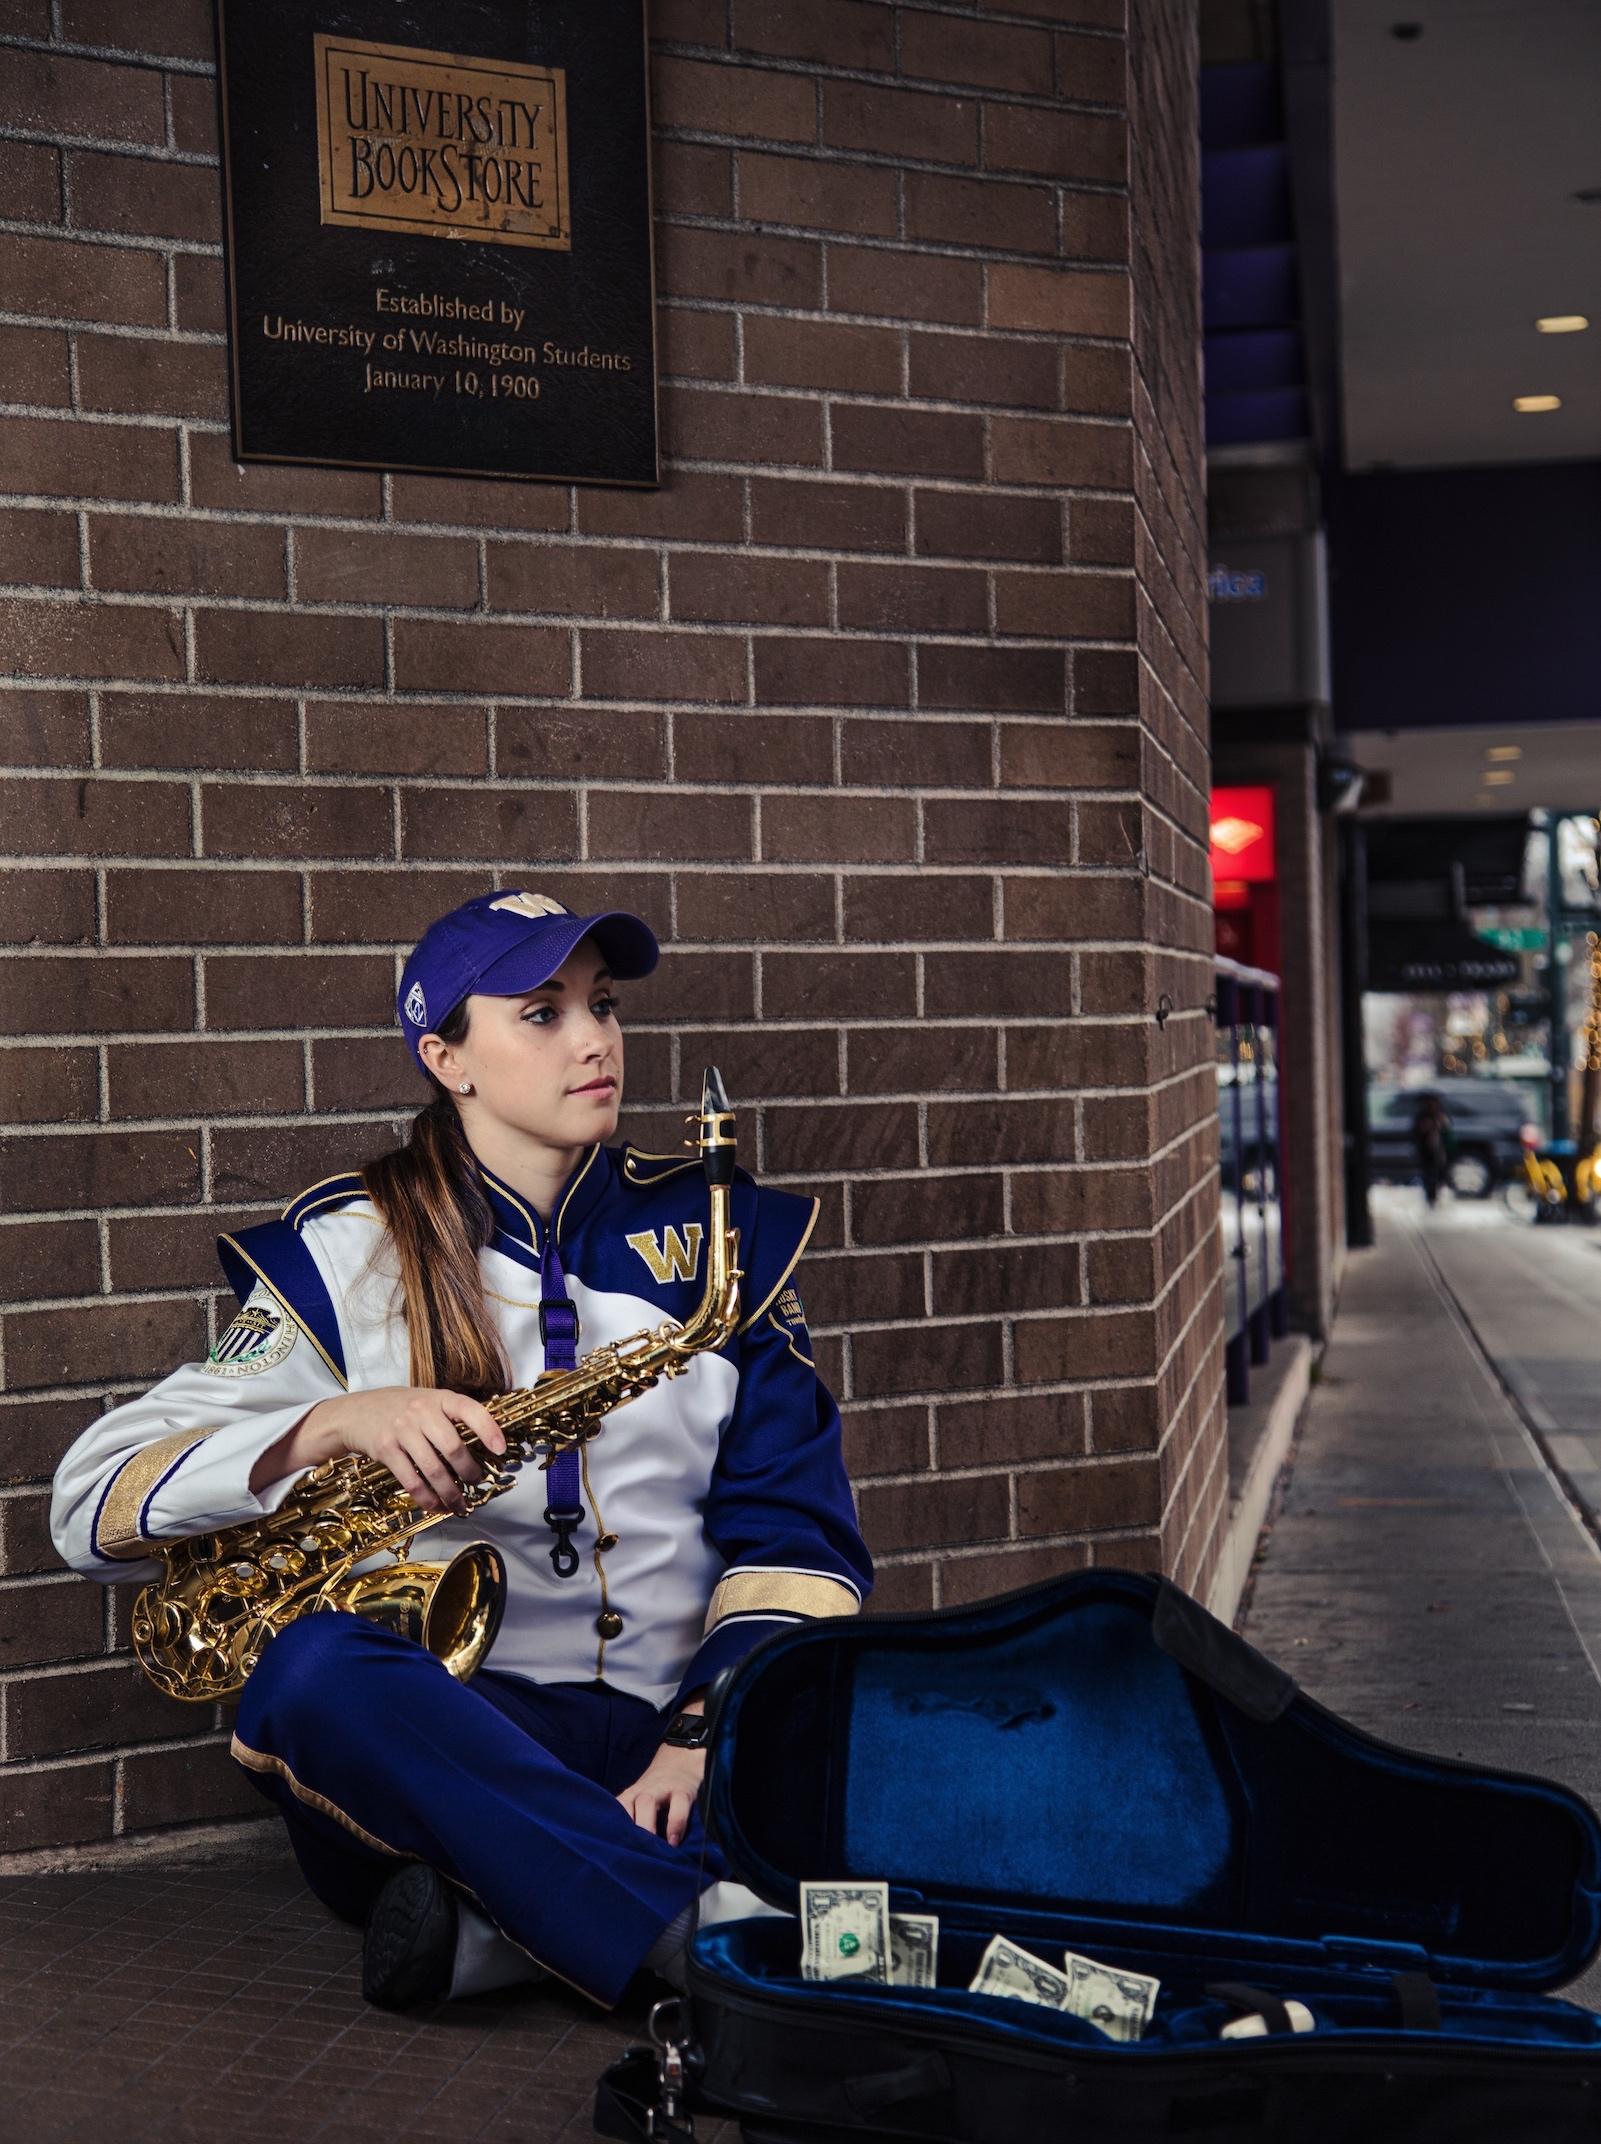 sarah randall, saxophone uw, sarah randall saxophone, marching band uw, uw book store